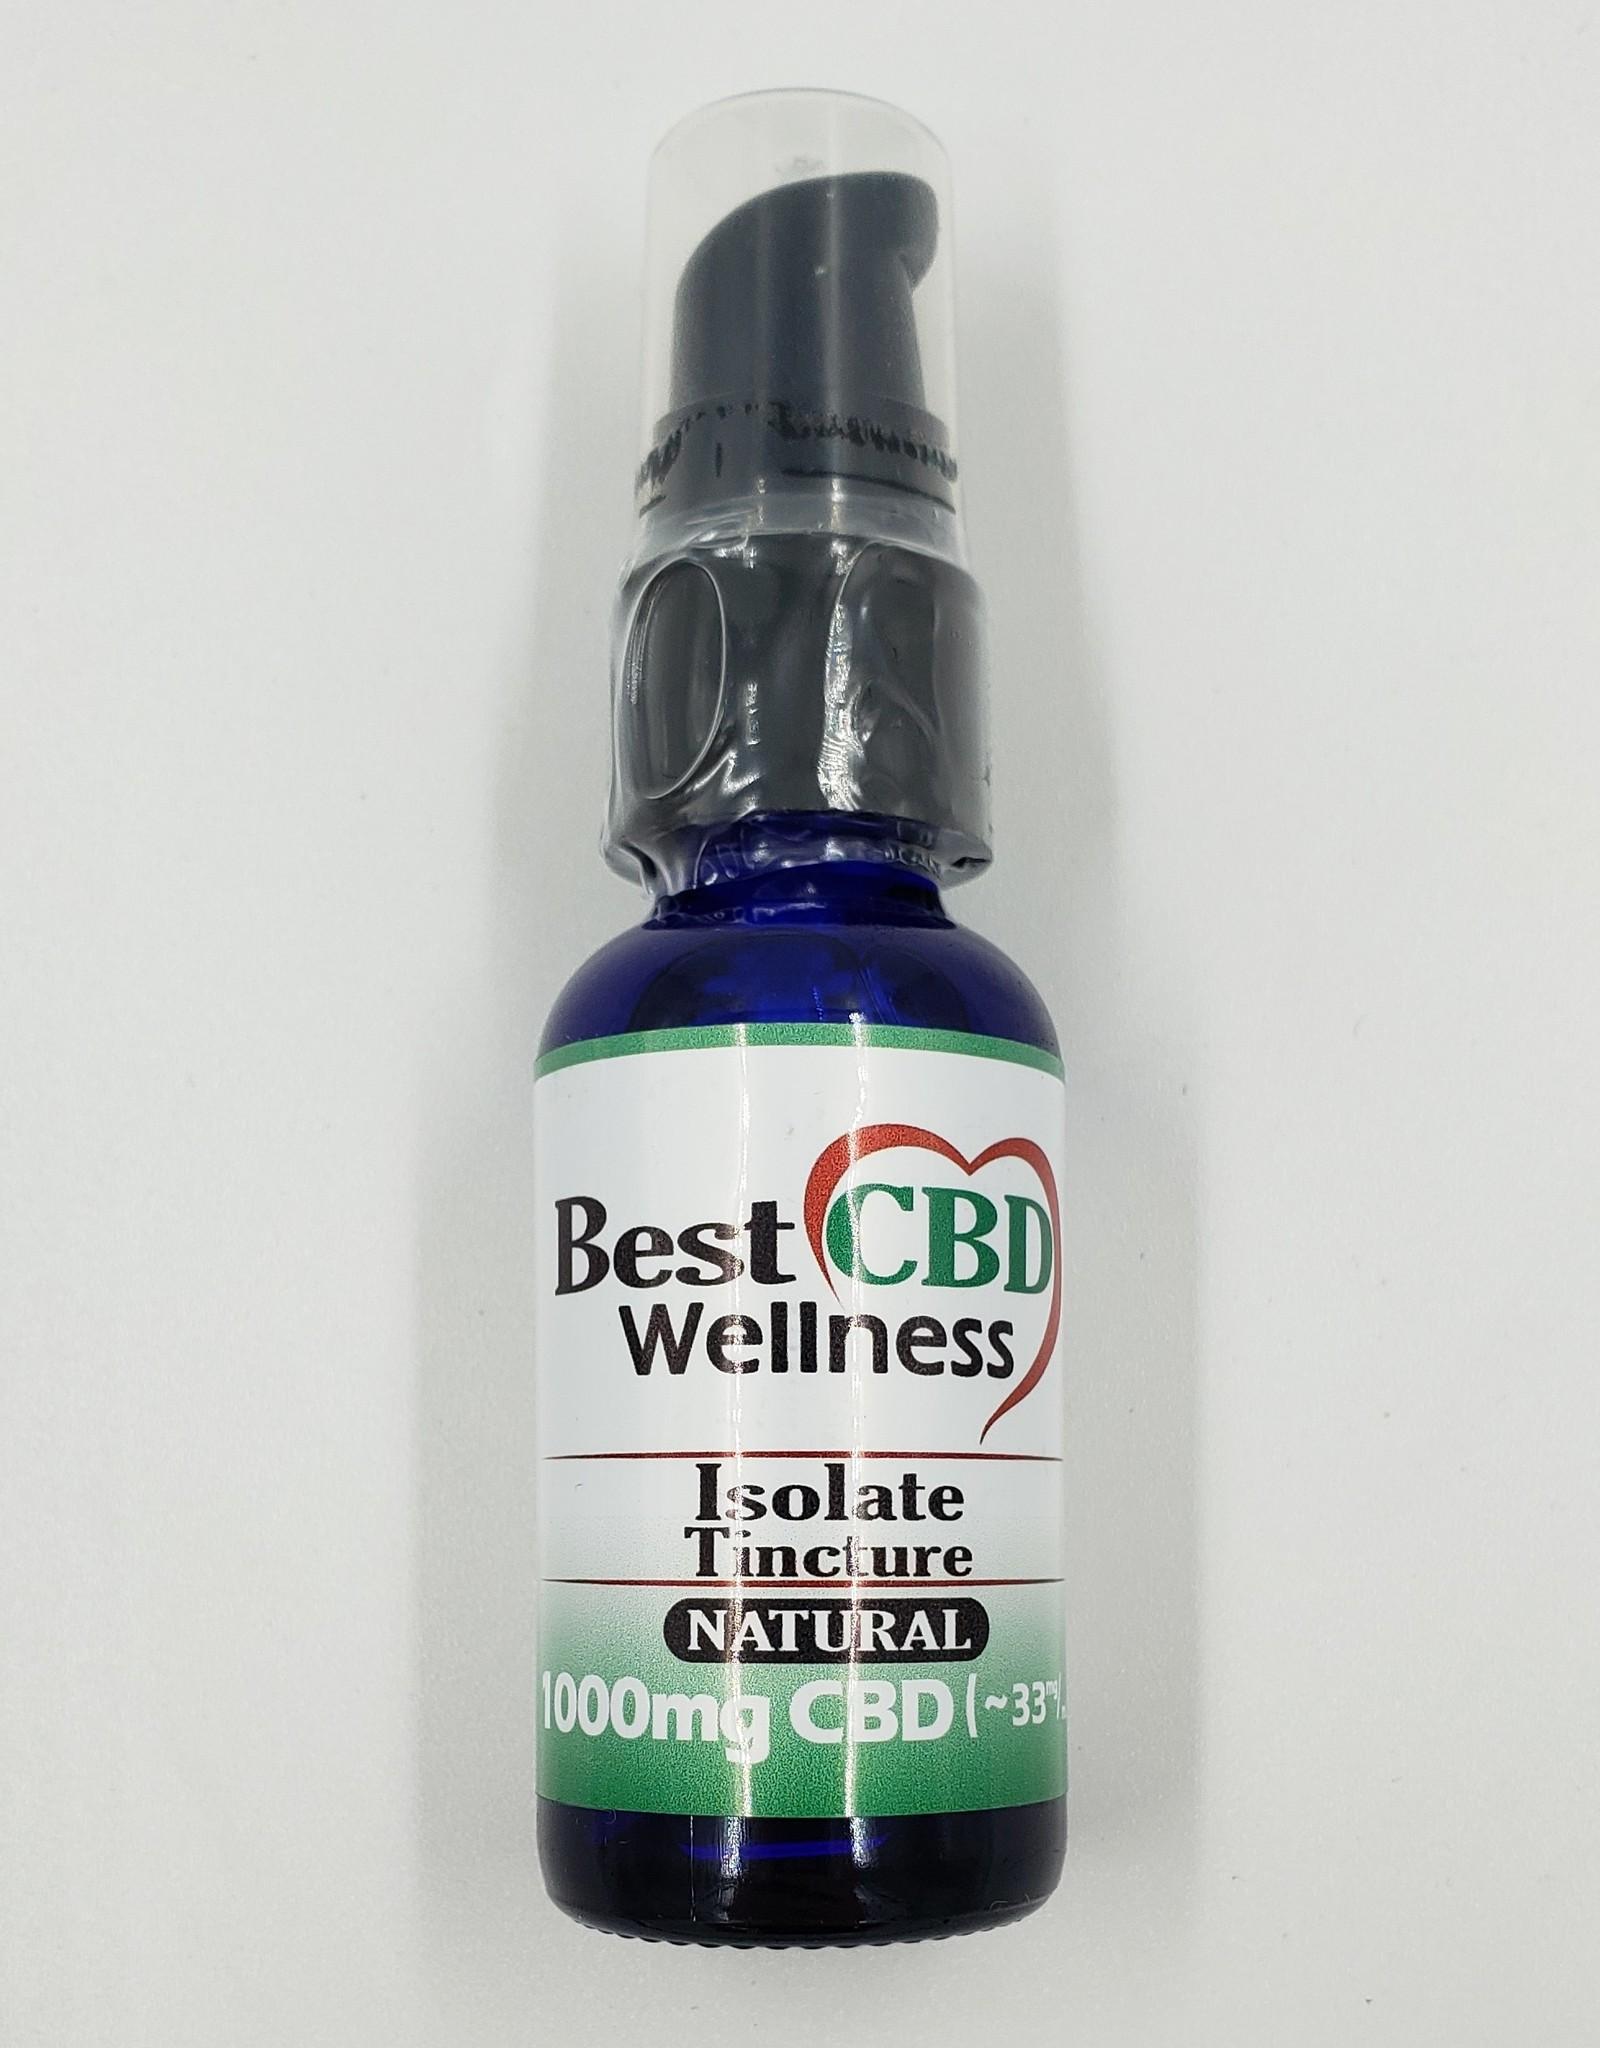 Best CBD Wellness Isolate CBD Oil Tincture 1000mg Natural Flavor